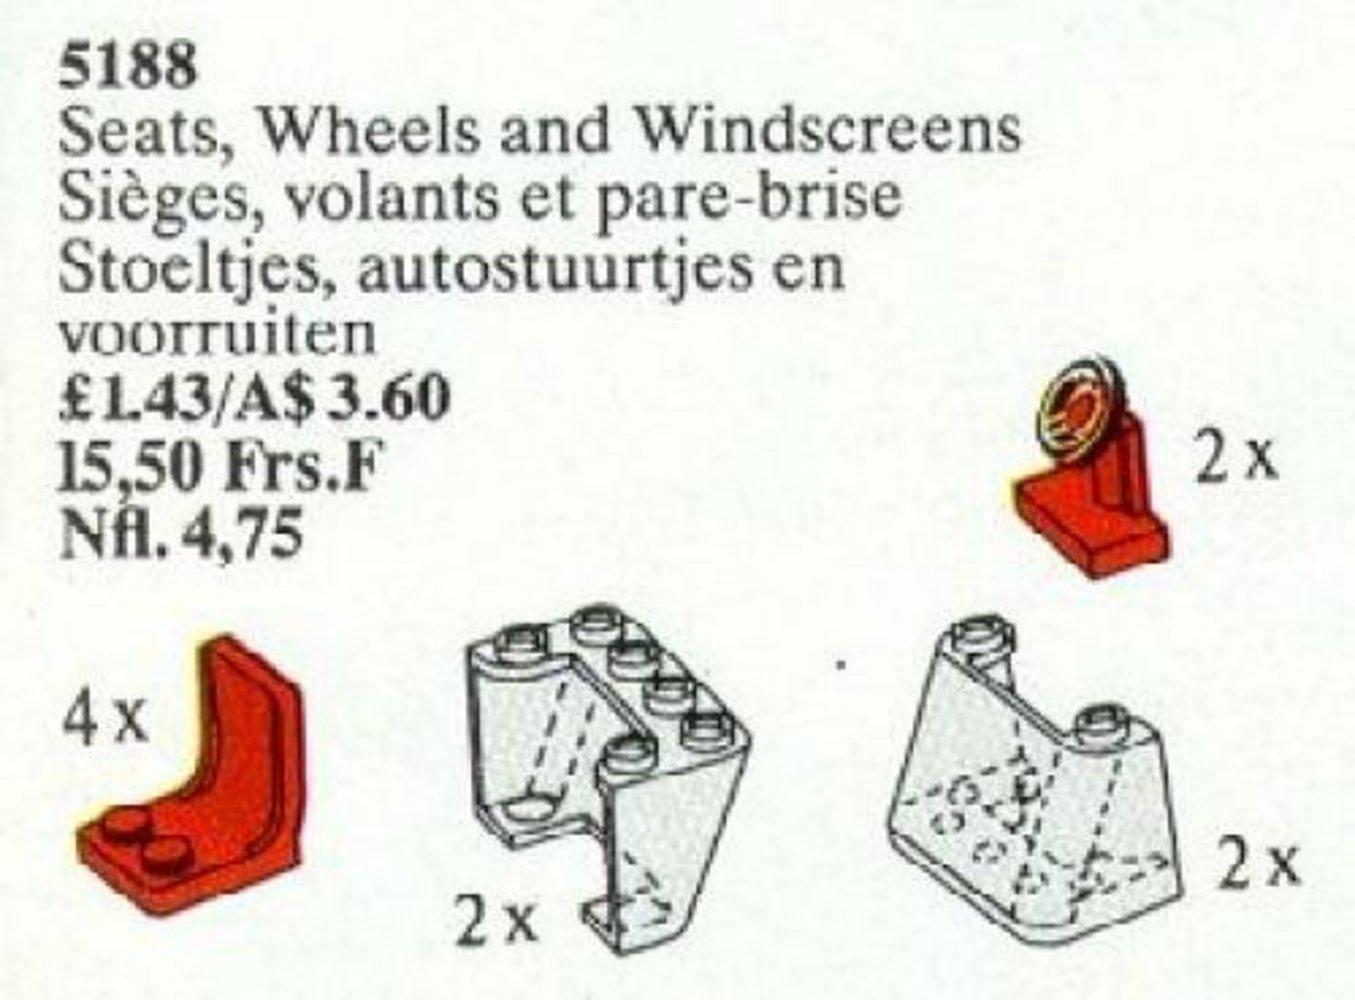 Seats, Steering Wheels and Windscreens